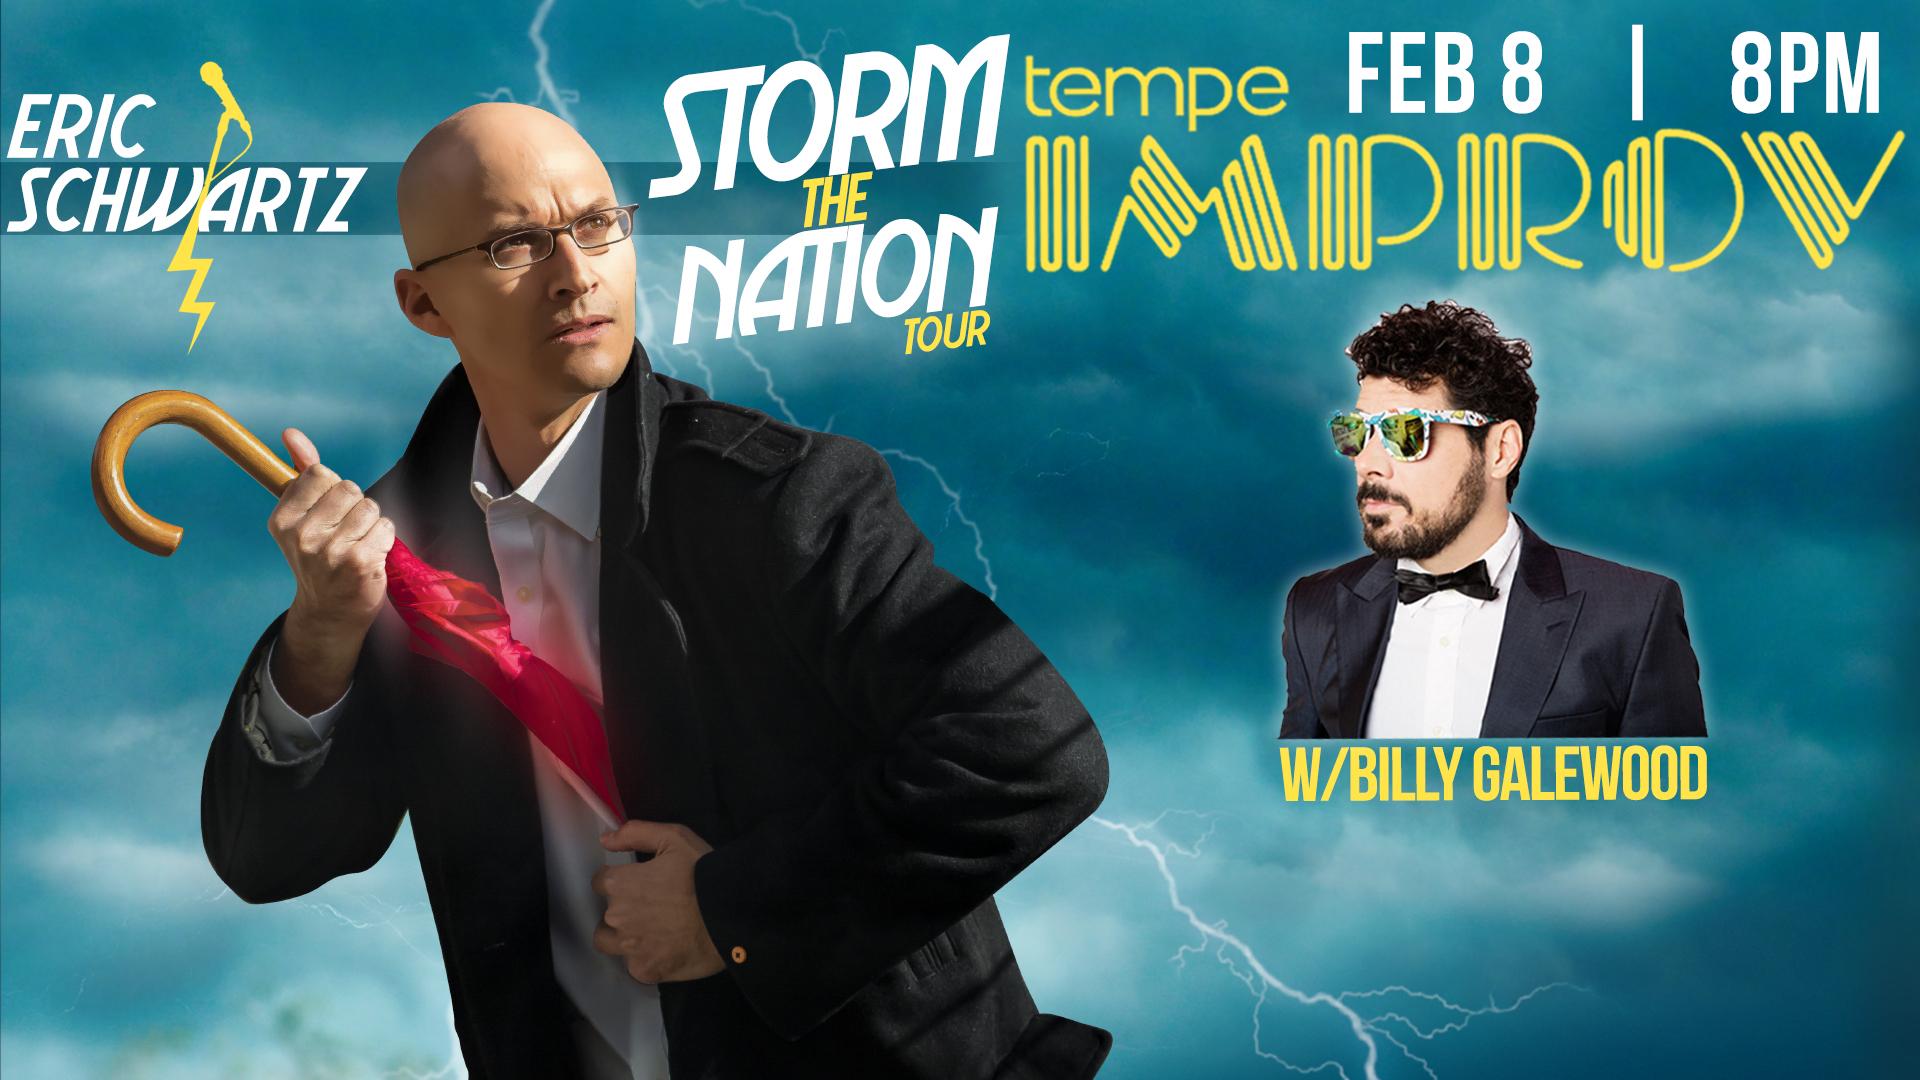 stormthenationfb-tempe